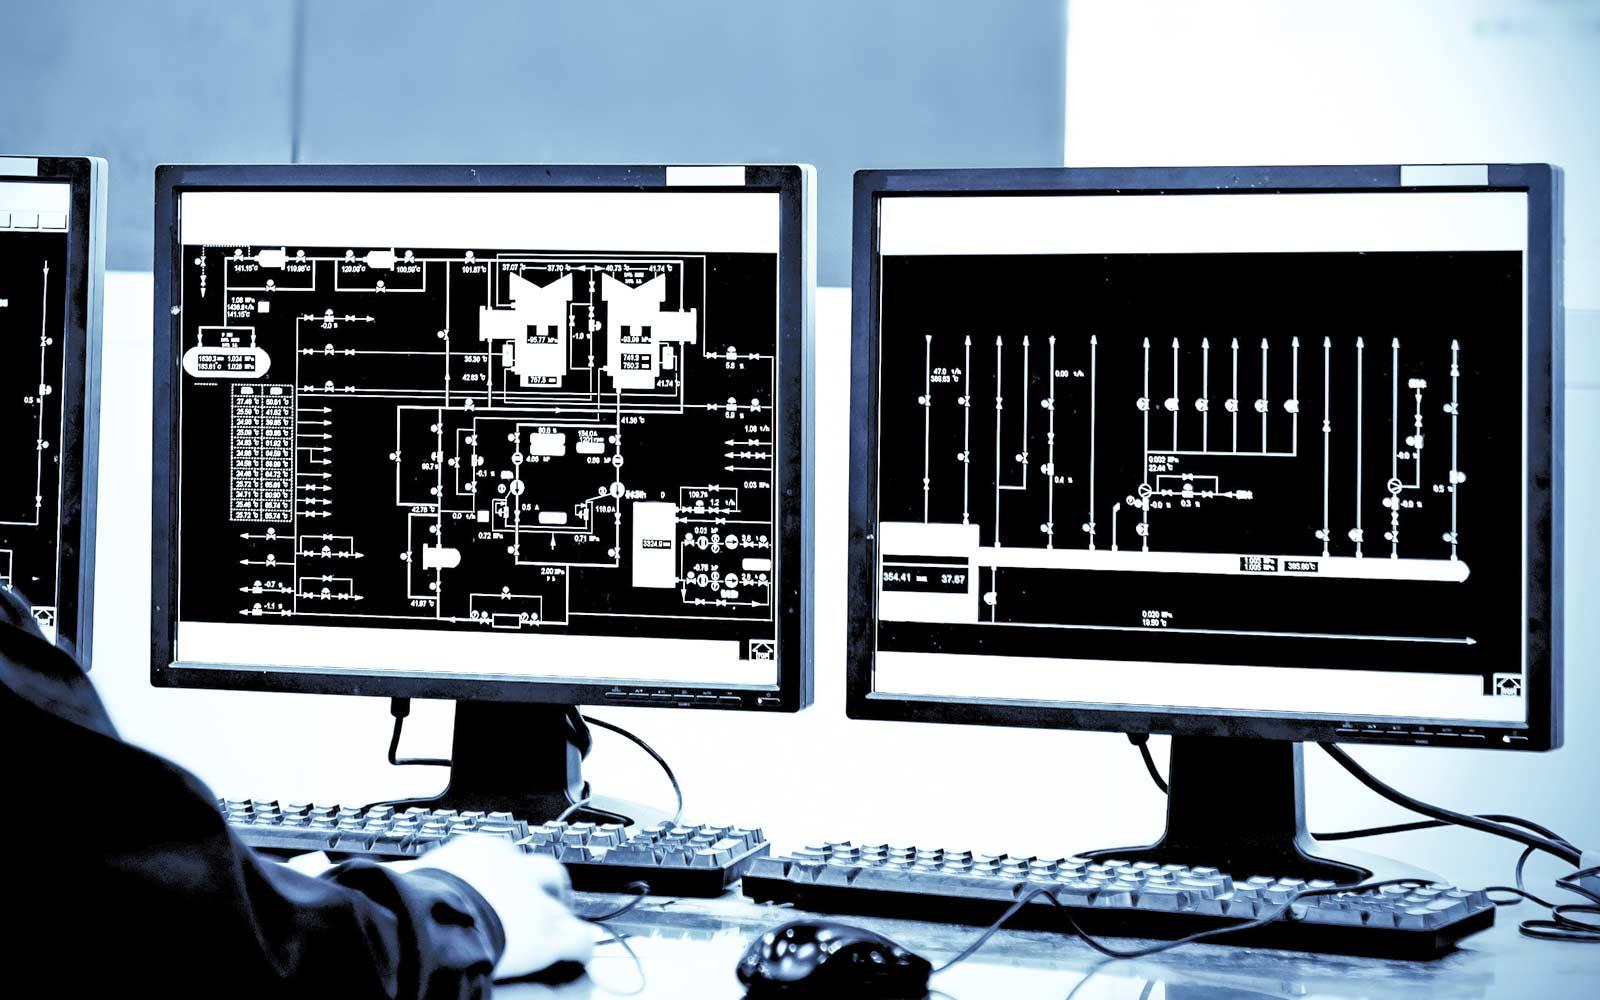 arintec GmbH: Automationstechnik | Regelungstechnik | Informationstechnik | Netzwerktechnik